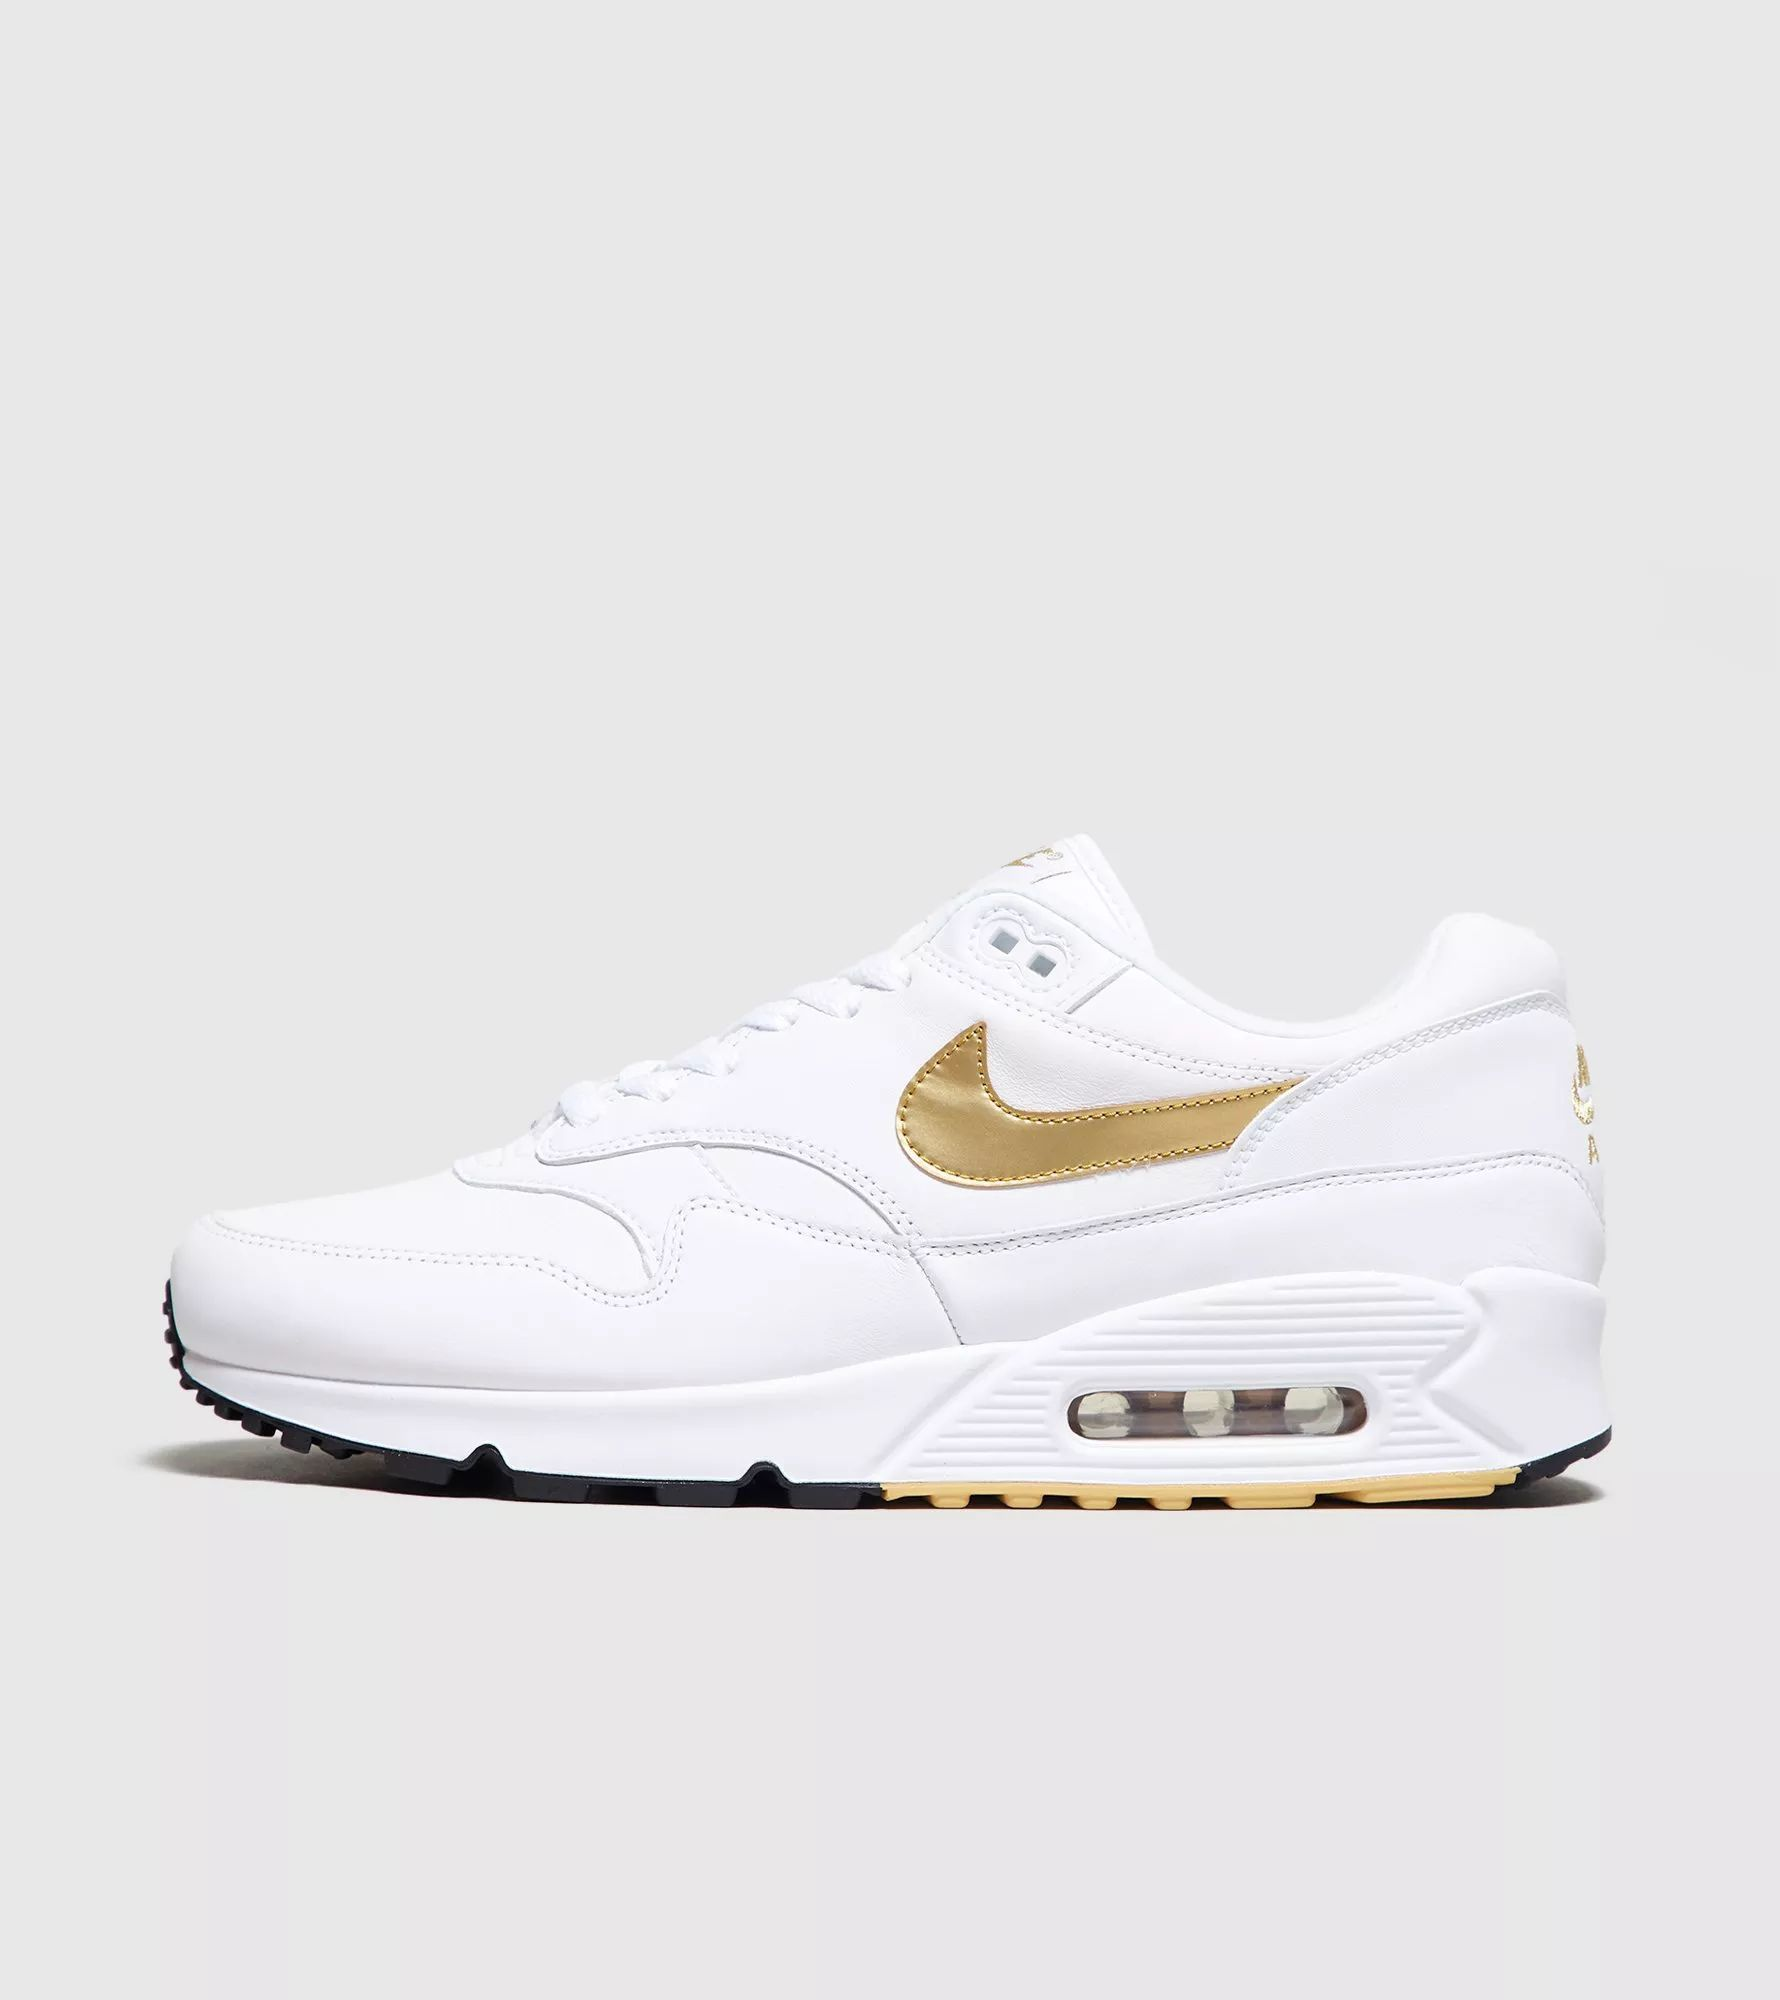 Nike Air Max 90 1 White Black Metallic Gold Mulheres Nike